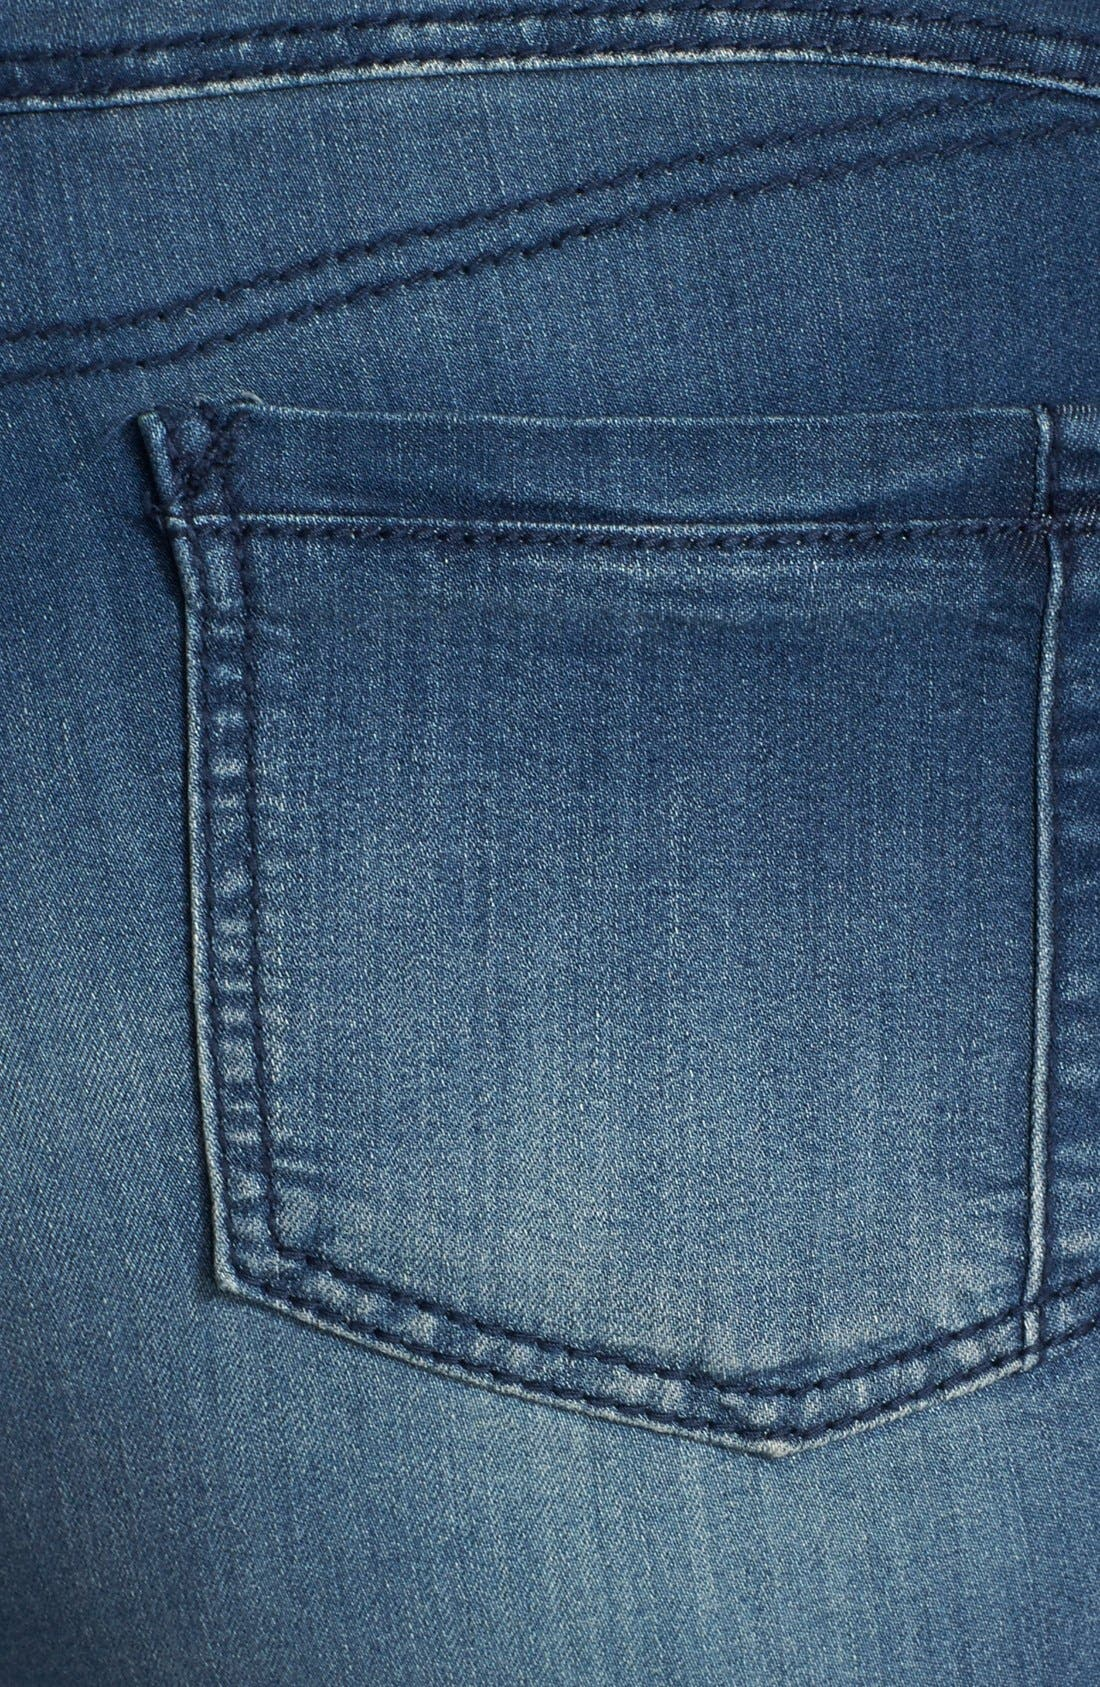 Alternate Image 3  - Poetic Justice 'Suzzie' Stretch Knit Denim Crop Jeans (Plus Size)